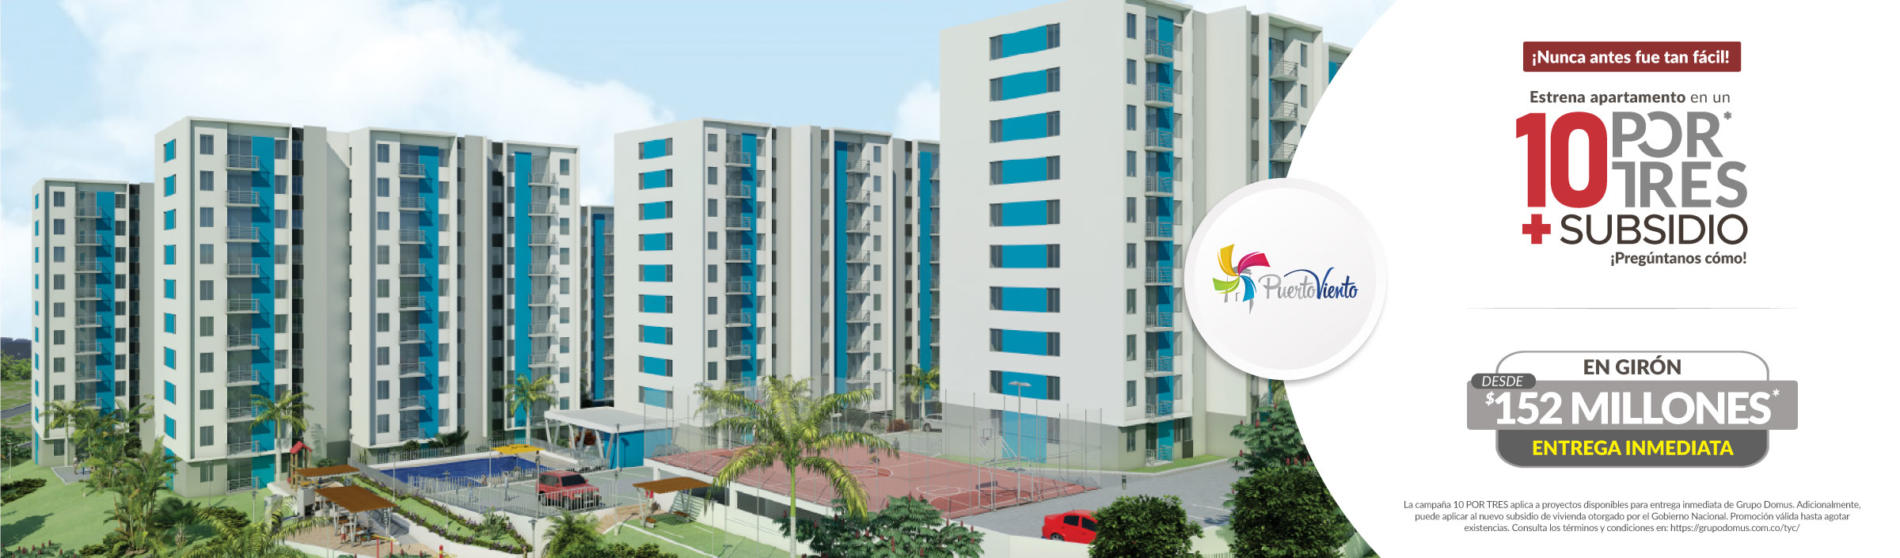 G-Domus-apartamentos-subsidio-gobierno-entrega-inmediata-giron-puertoviento